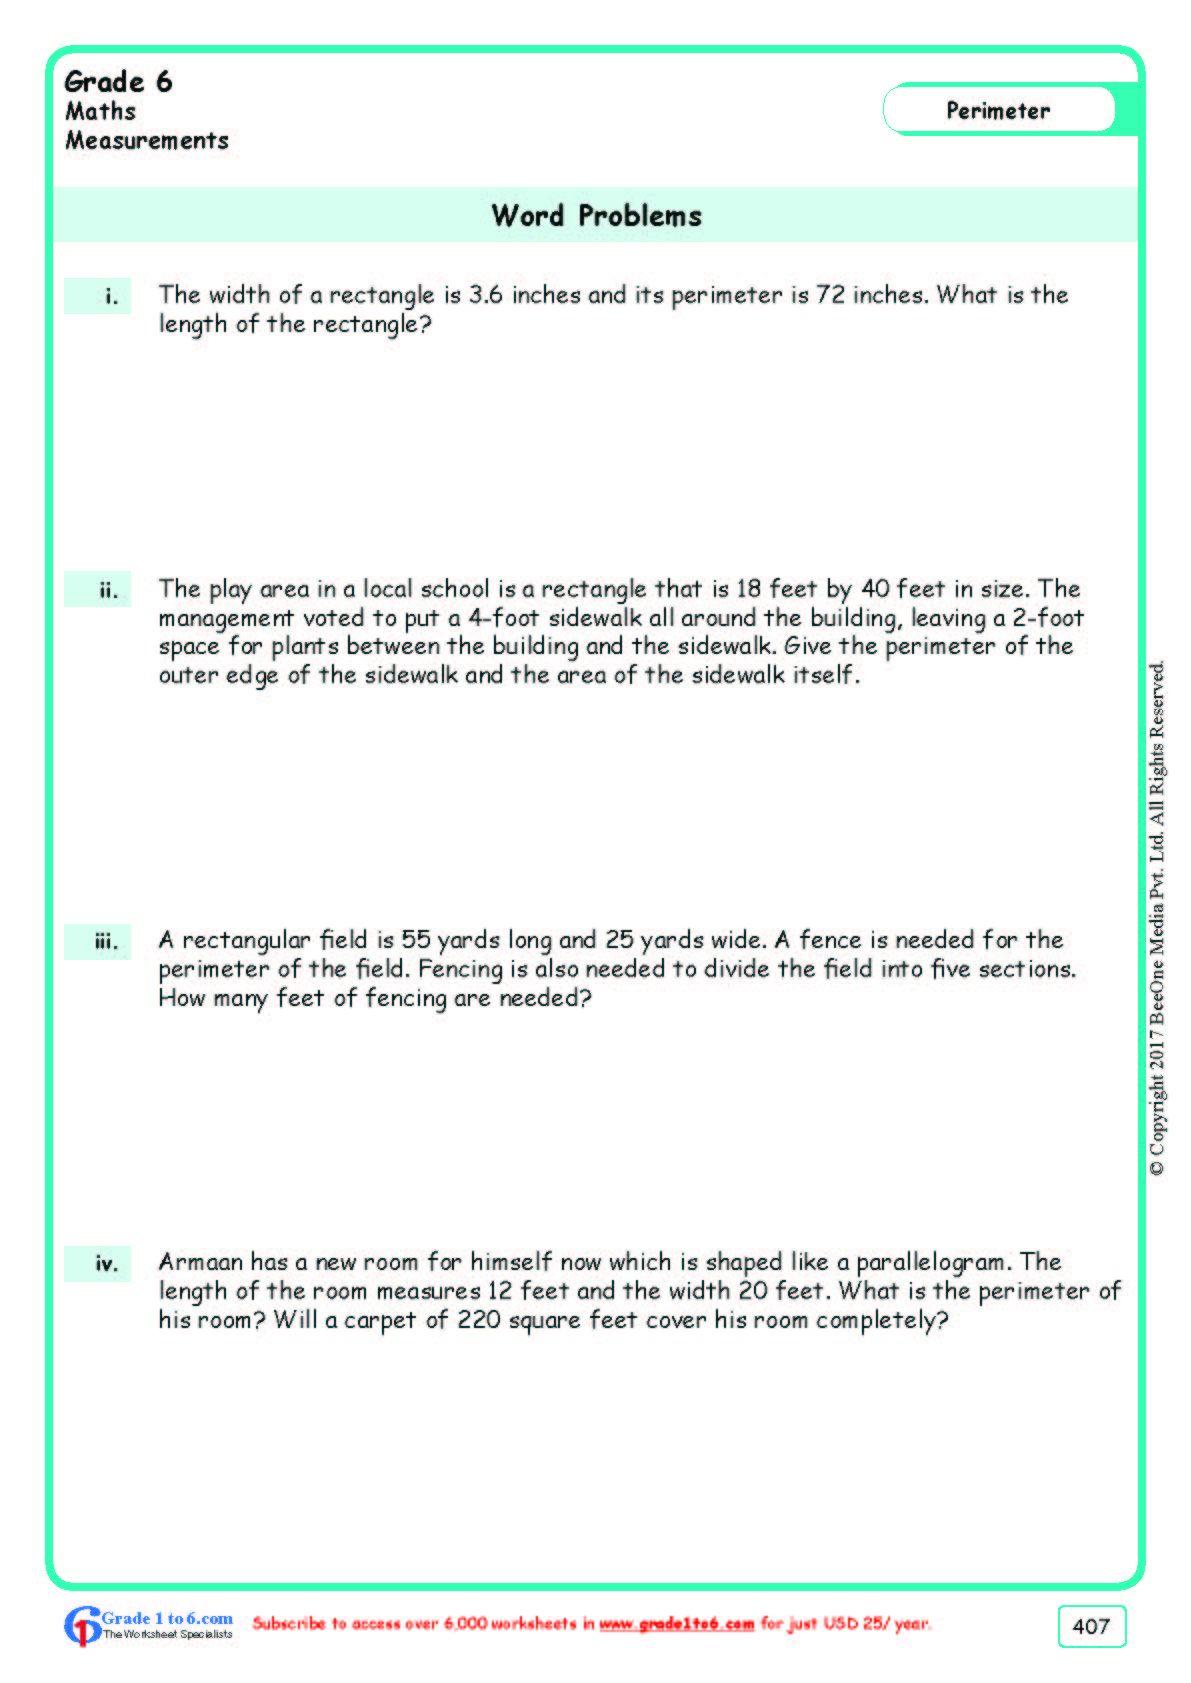 medium resolution of Worksheet Grade 6 Math Word Problems   Math word problems